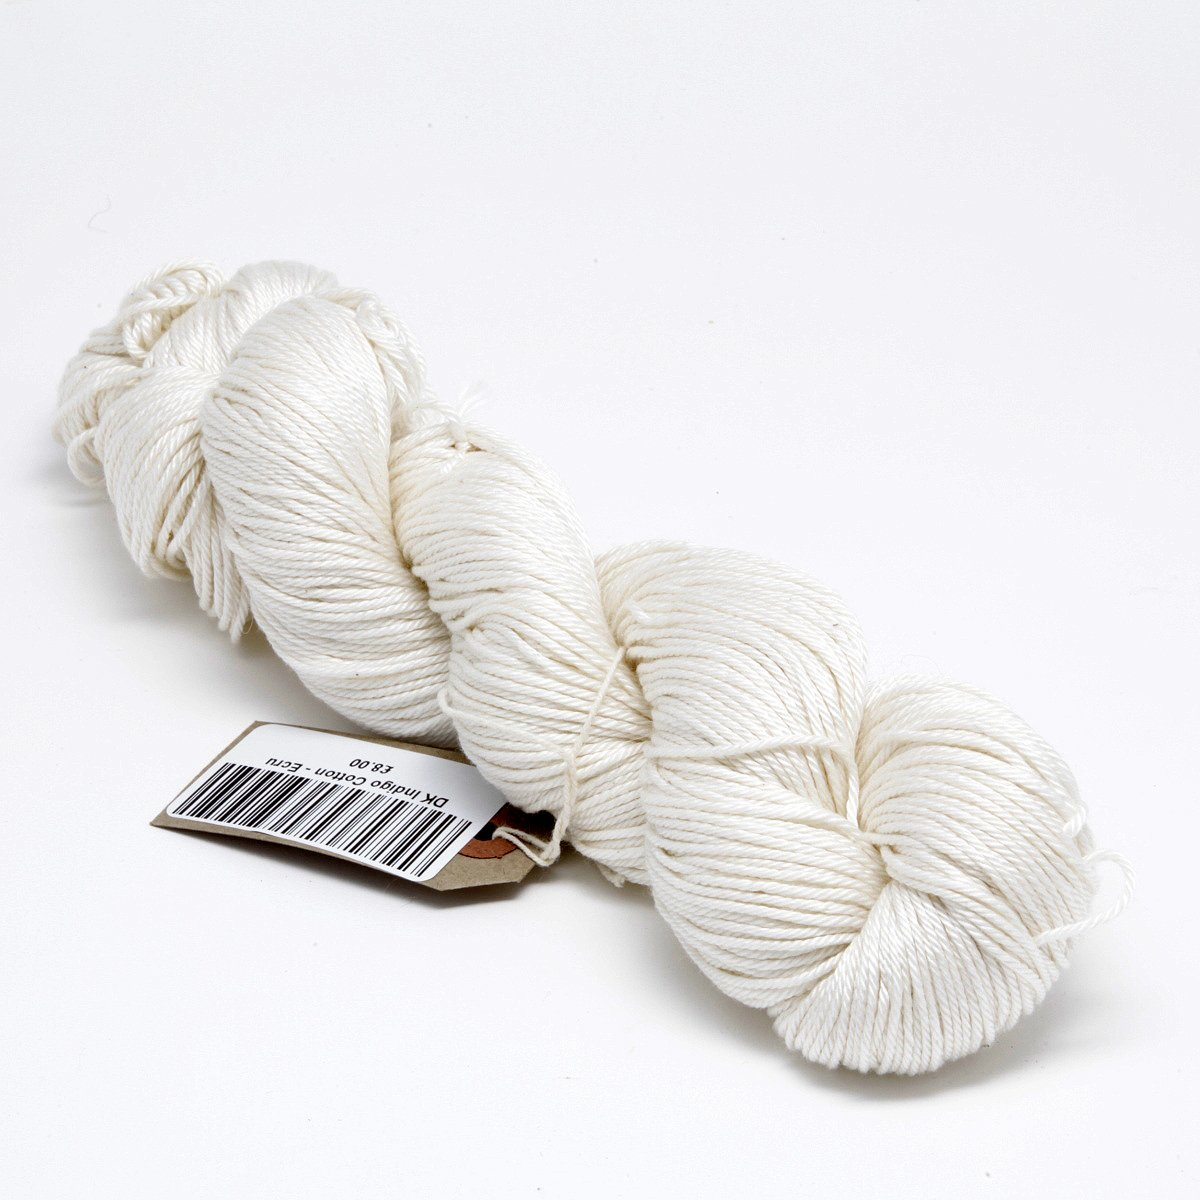 Undyed Pima Cotton yarn DK